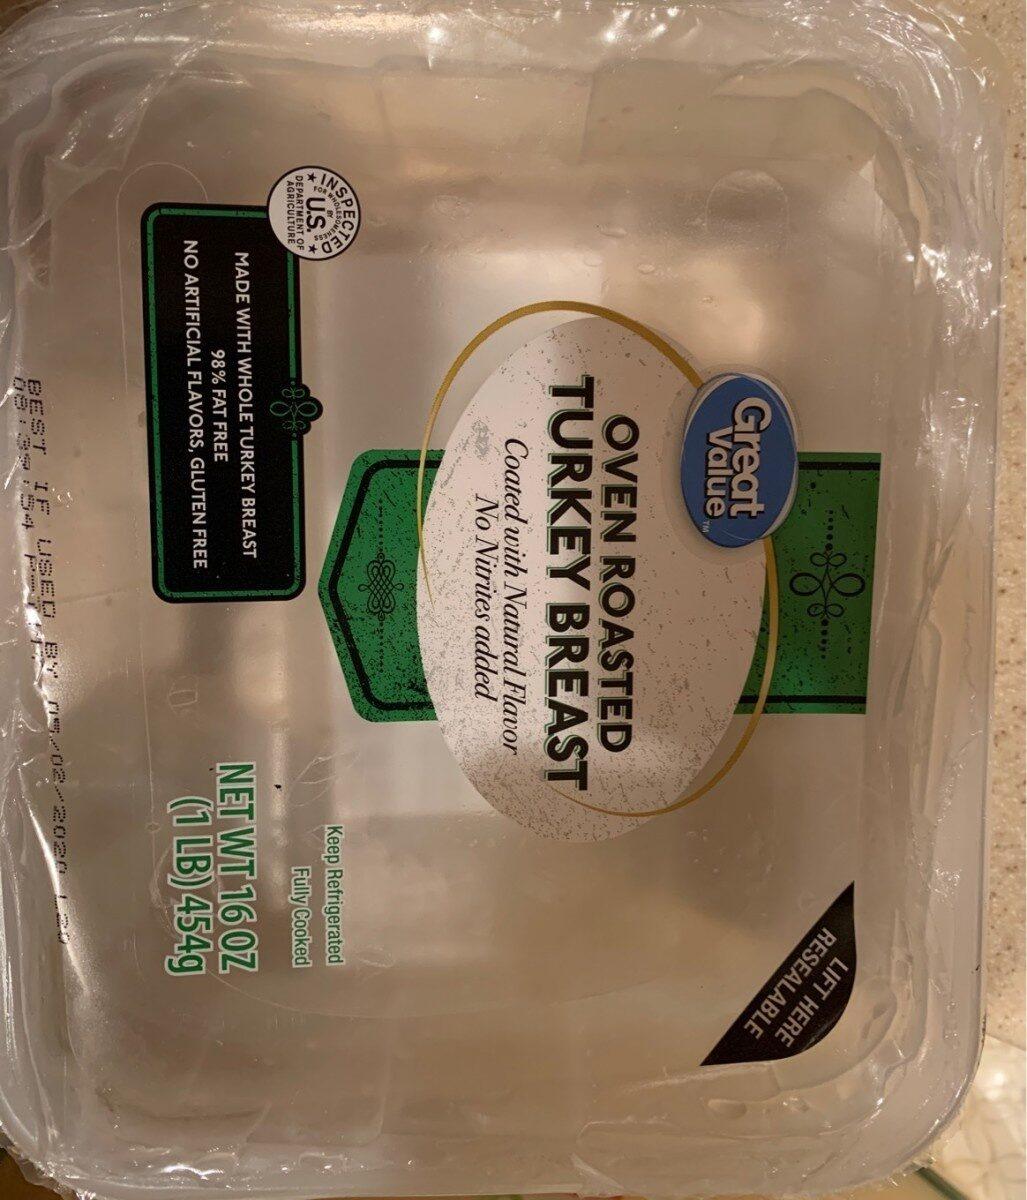 Oven roasted turkey breast - Product - en